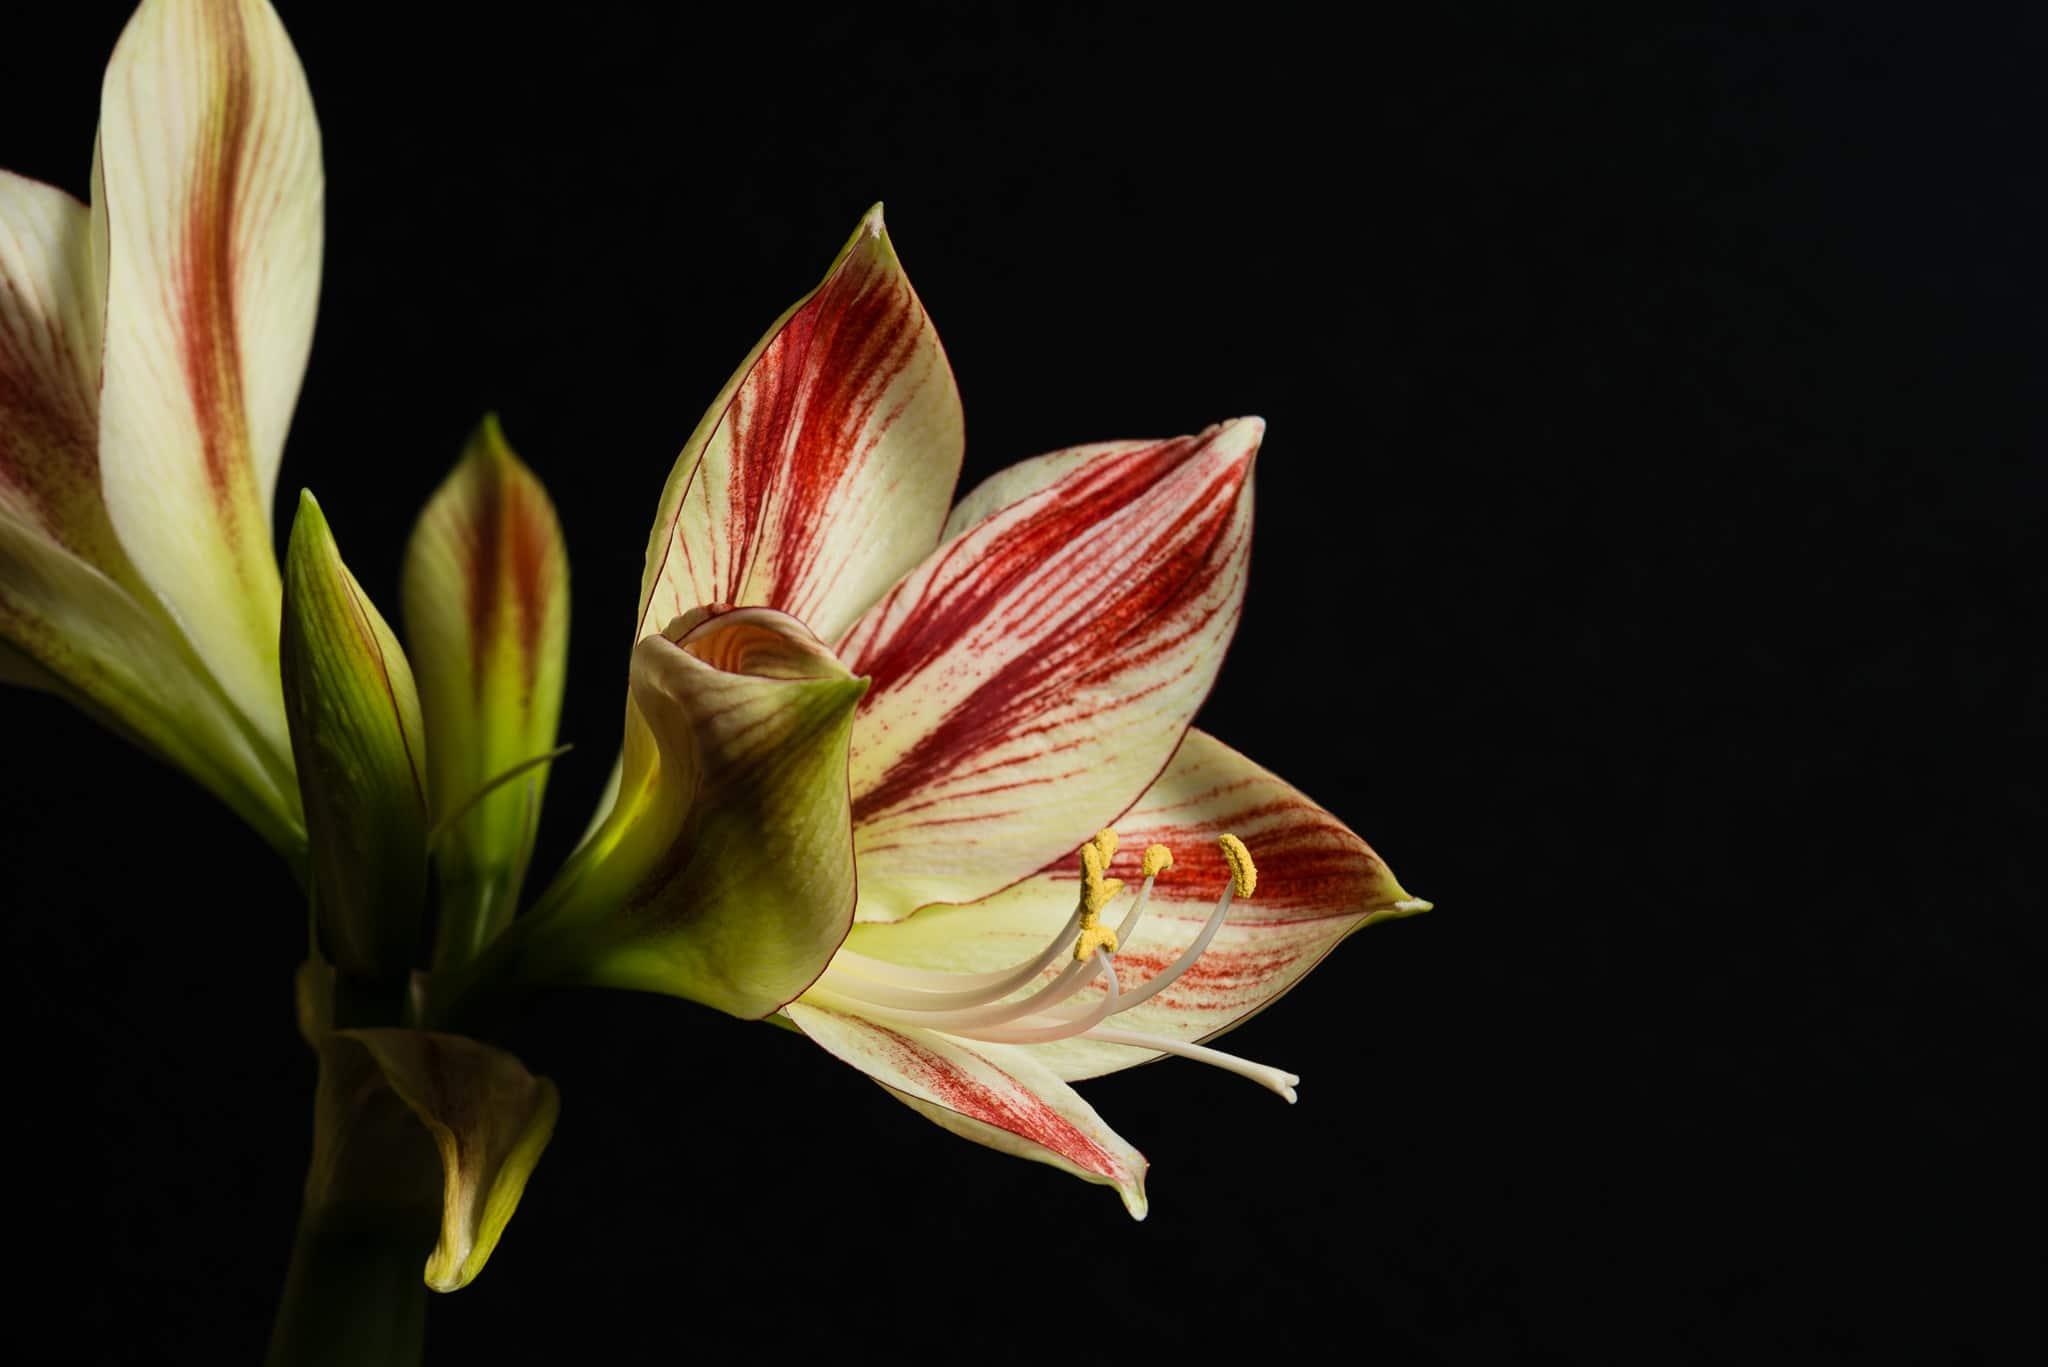 Einmal Blumen Fotos mit Blitz, Makroobjektiv und Co., (Foto copyright - Frank Weber - Berlin - fotologbuch.de)